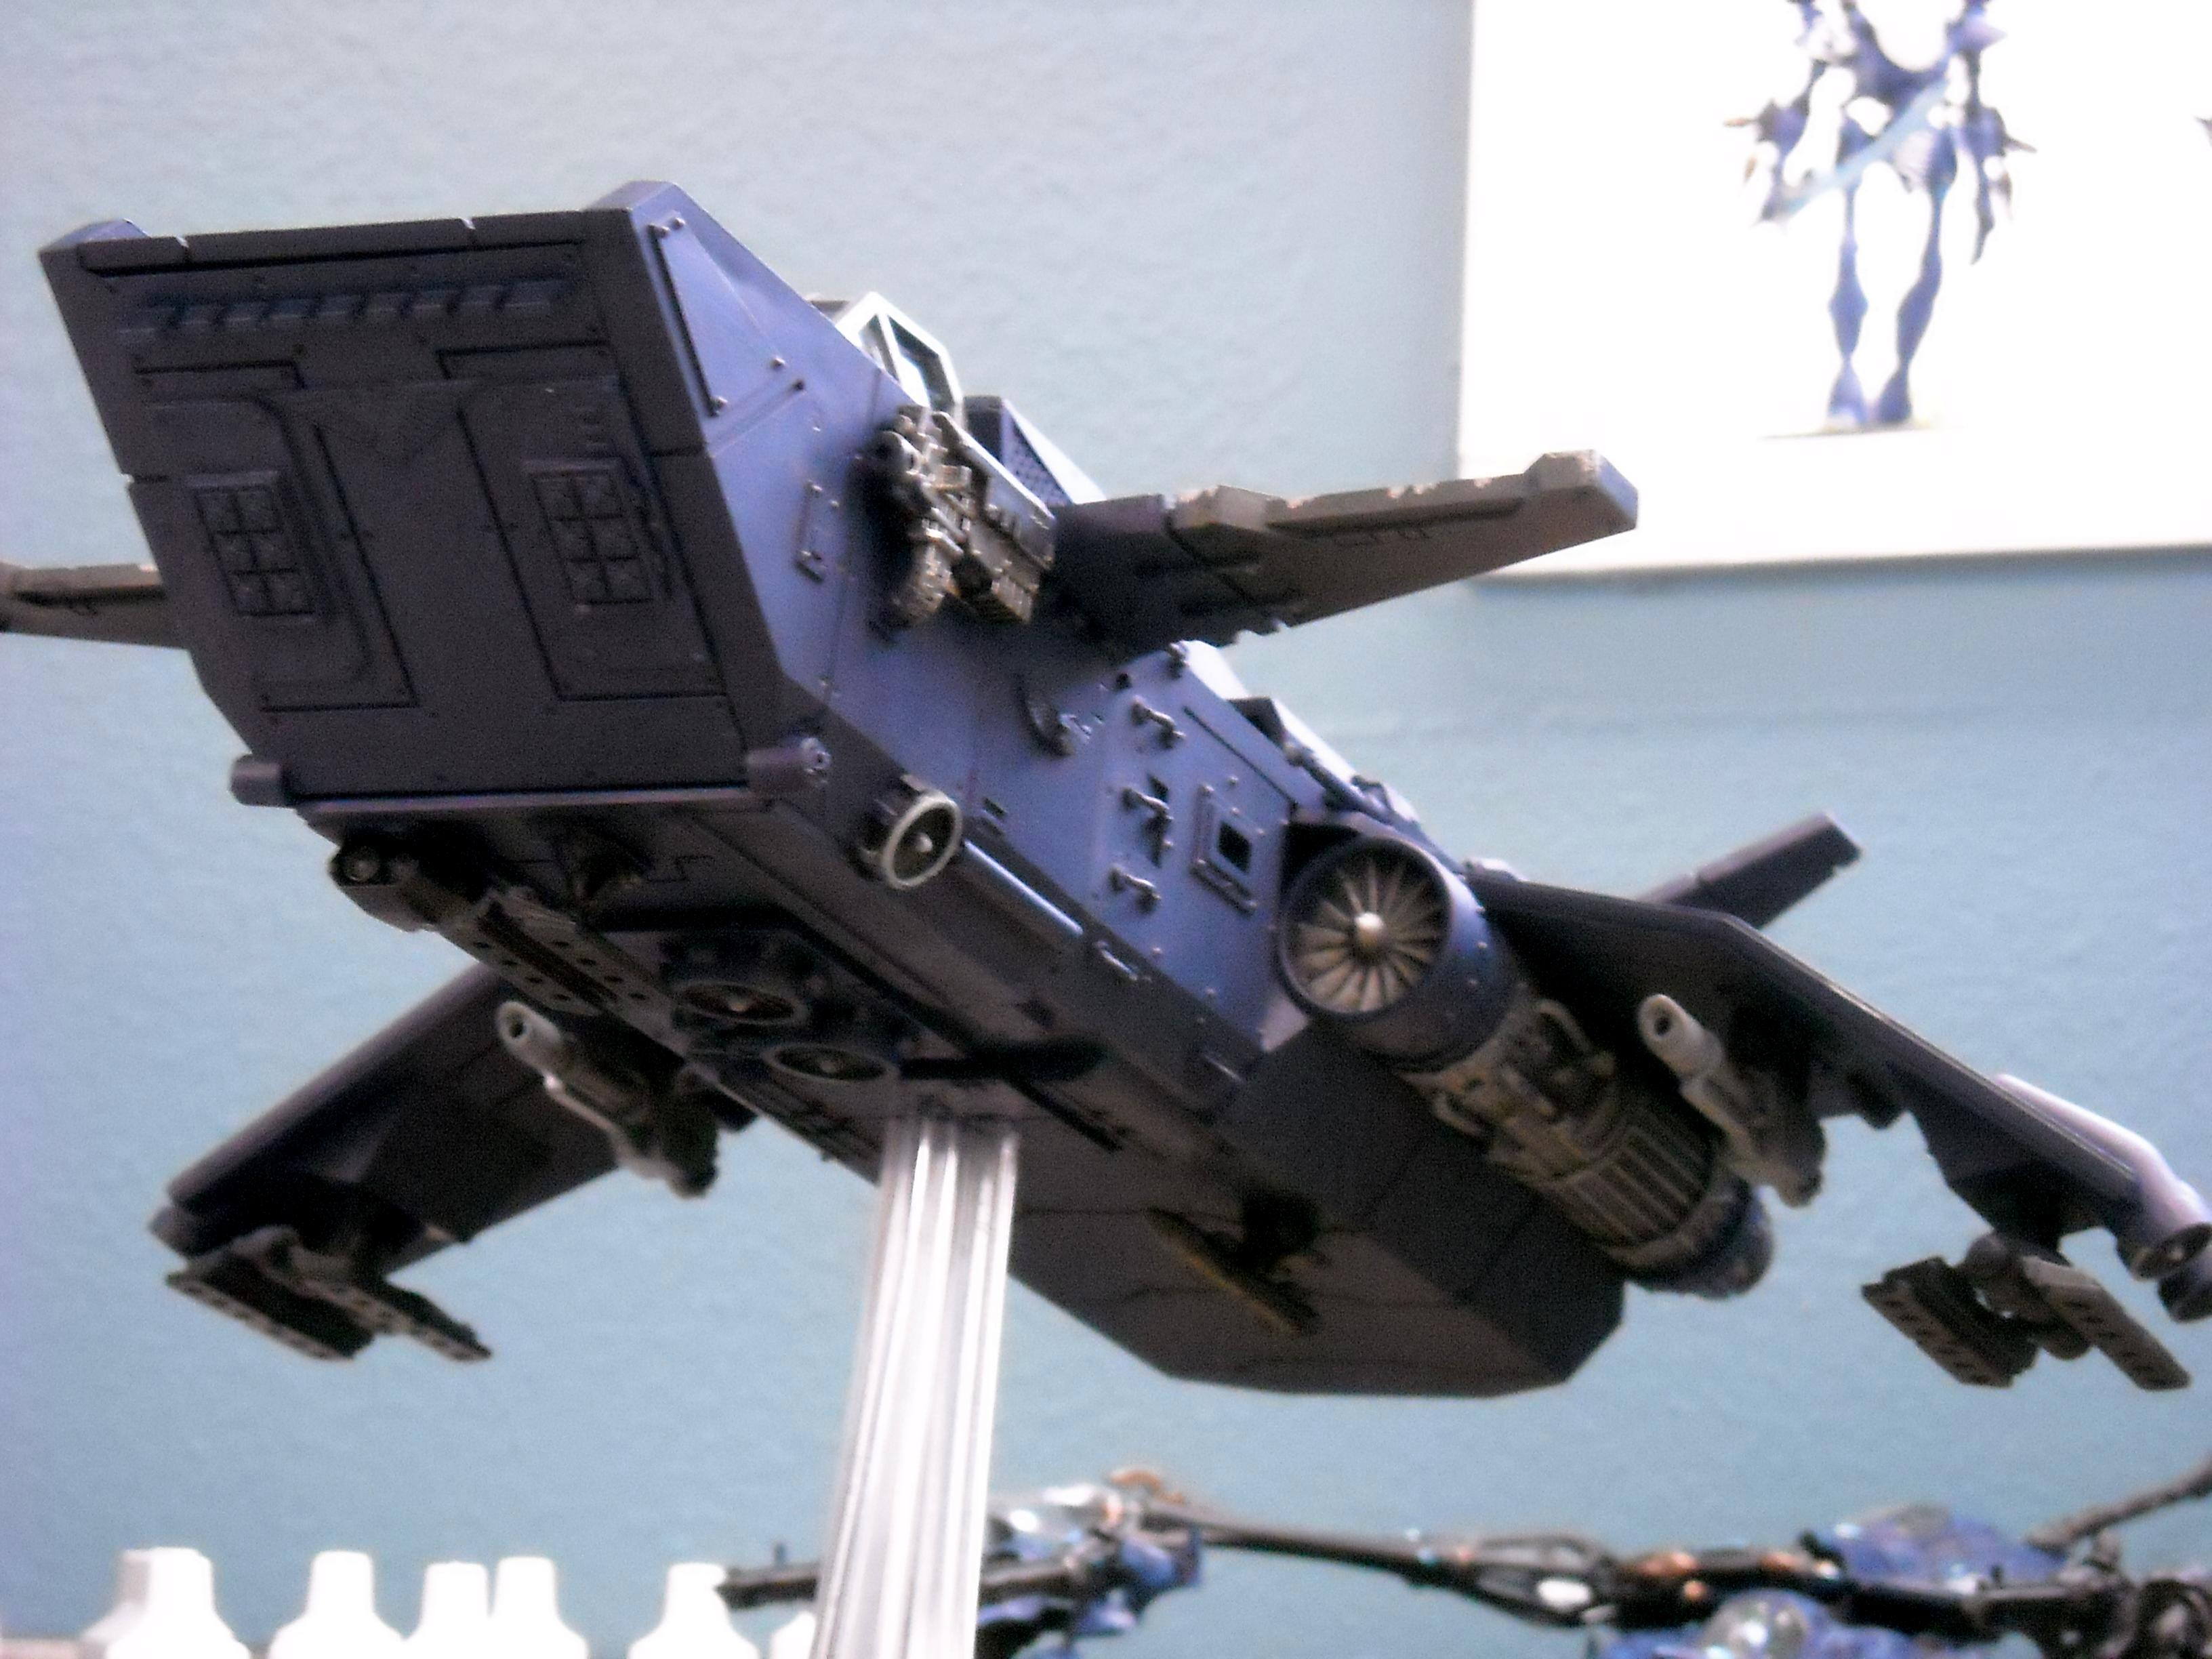 Alpha Legion, Chaos, Conversion, Dark Mechanicum, Flyer, Gunship, Mechanicus, Storm Raven, Stormraven, Valkyrie